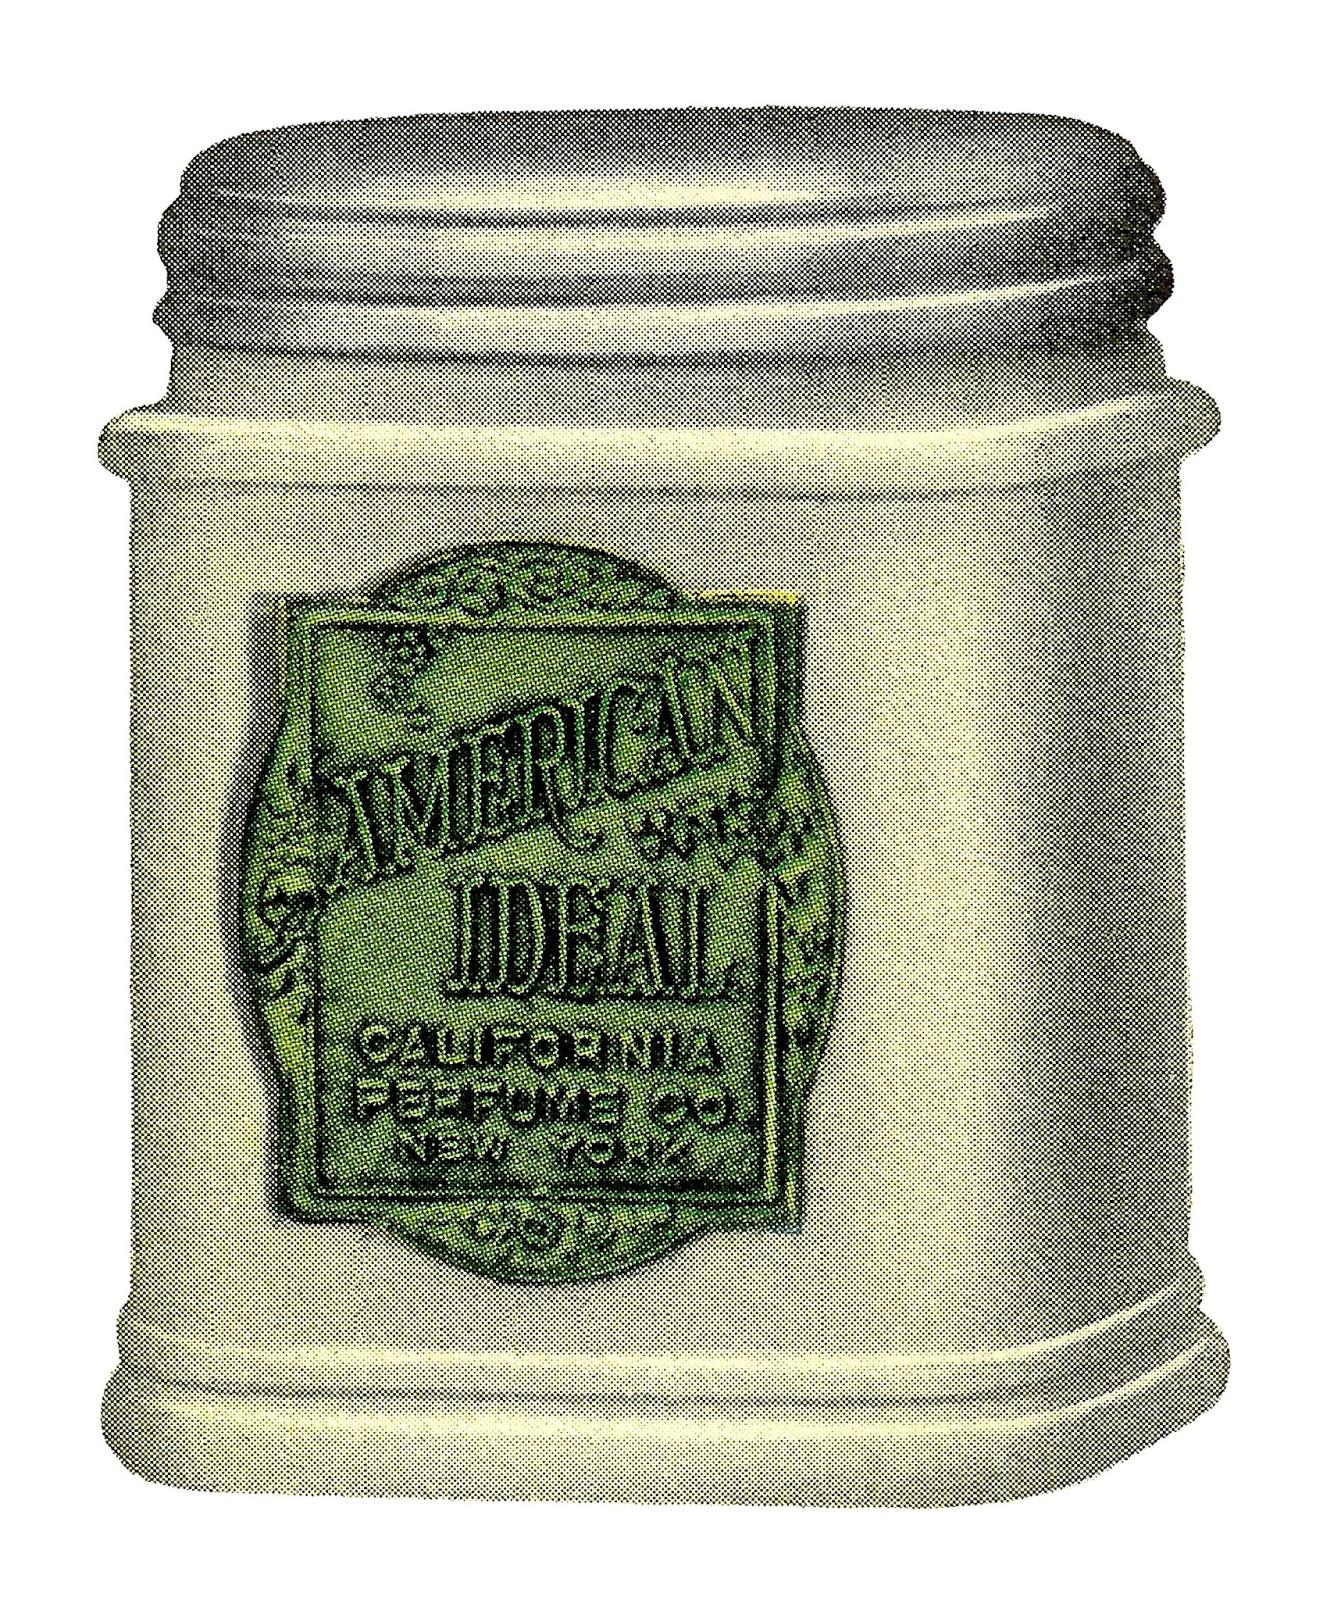 Antique images product image. Beauty clipart vintage beauty